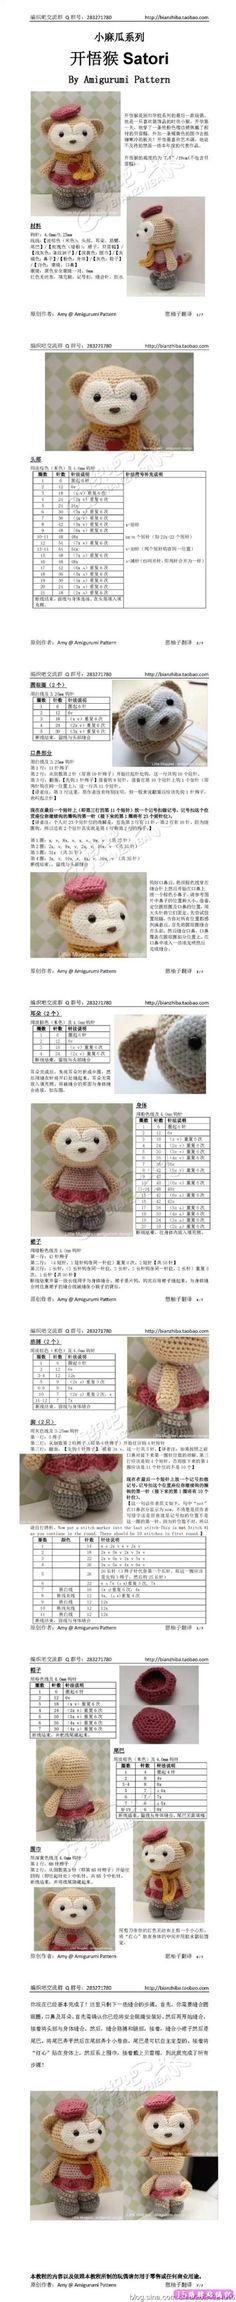 711 best Amigurumi免費教程 images on Pinterest in 2018 | Crochet ...